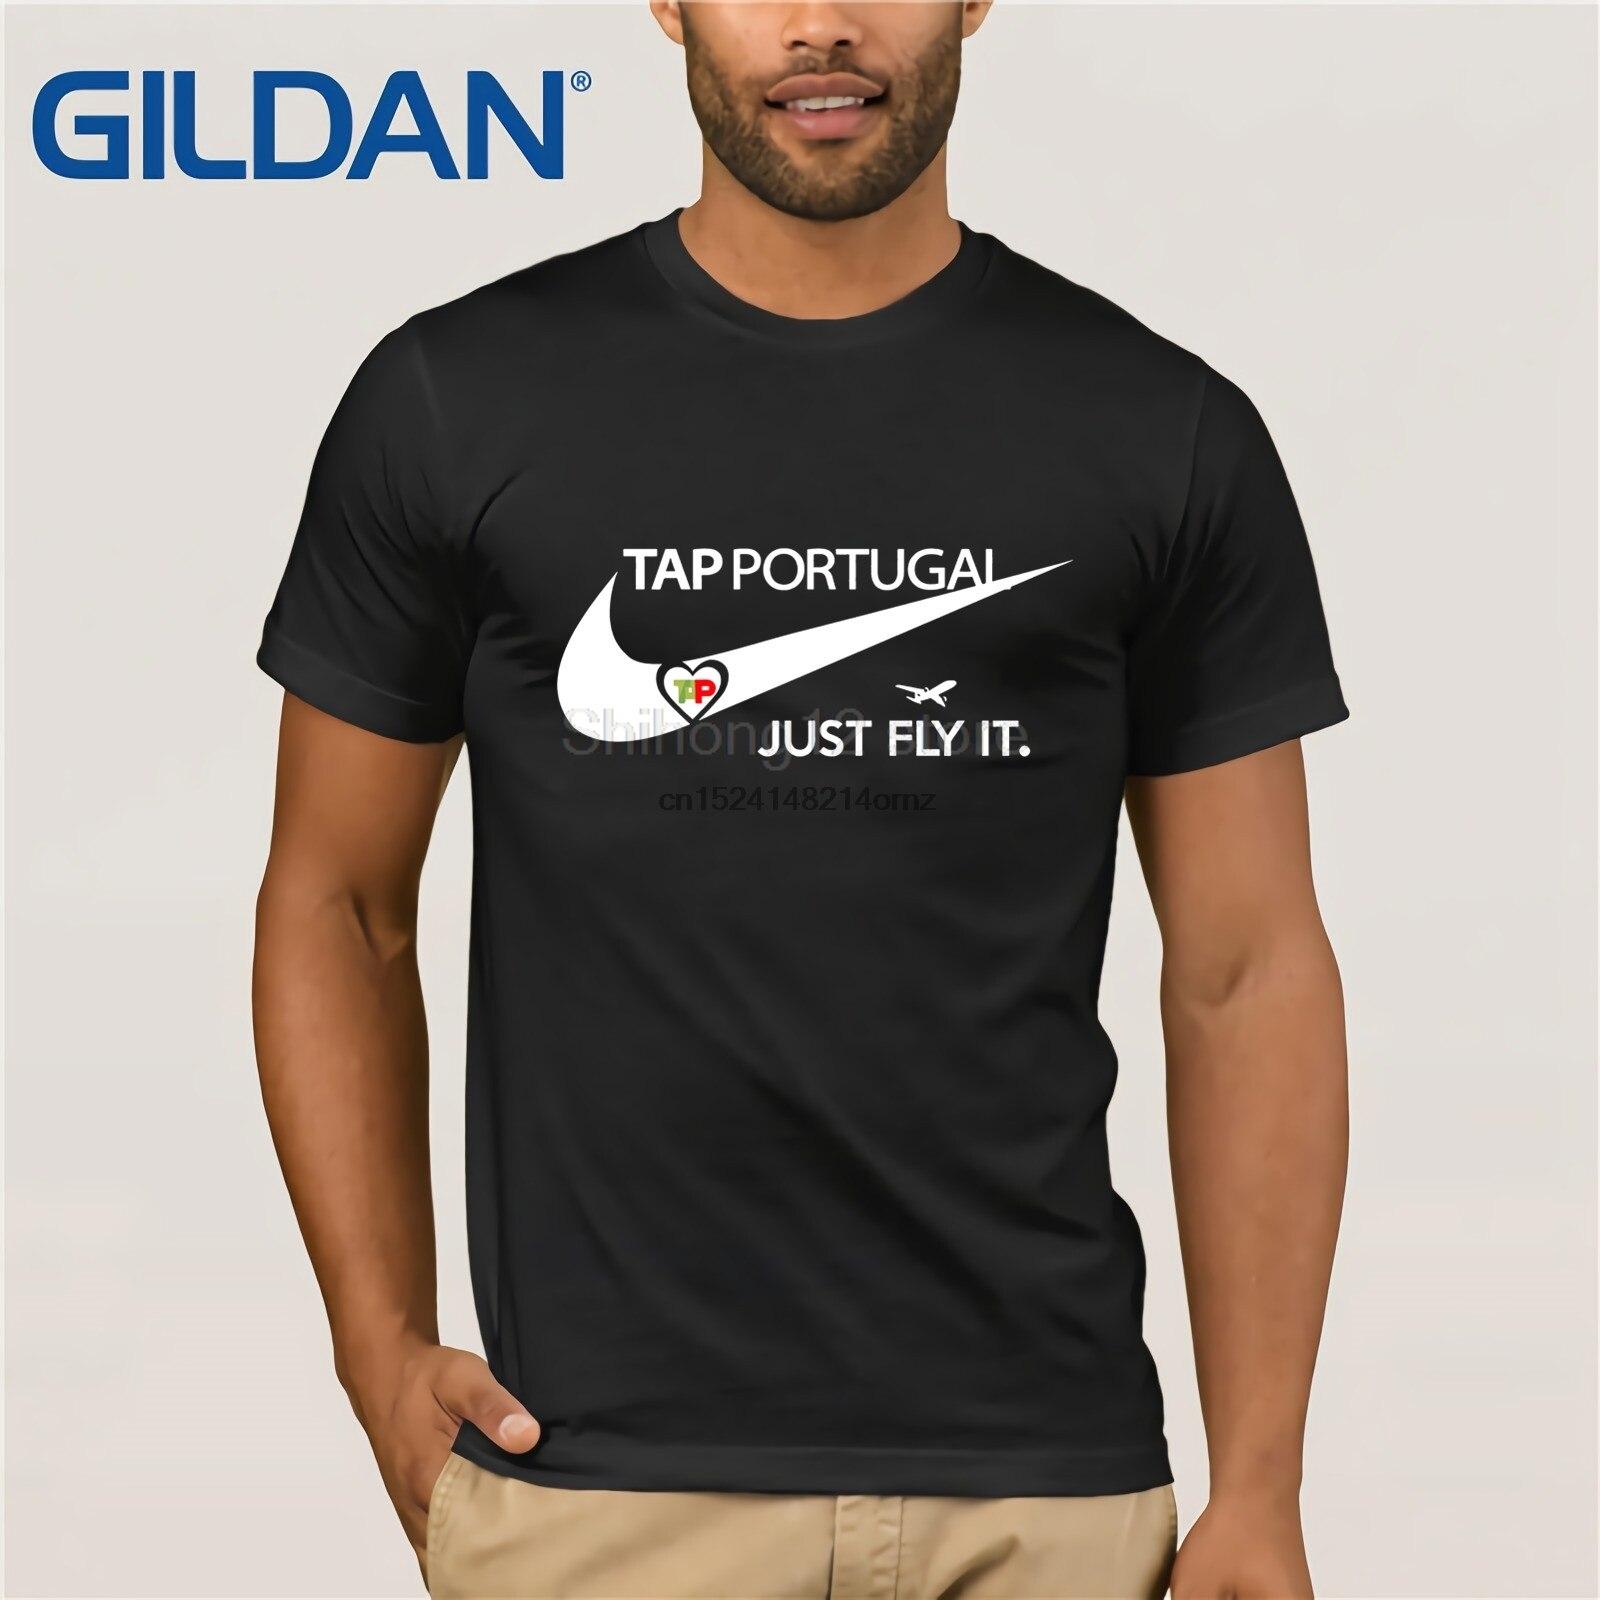 Camiseta de moda 2019 para hombre TAP Air Portugal fly